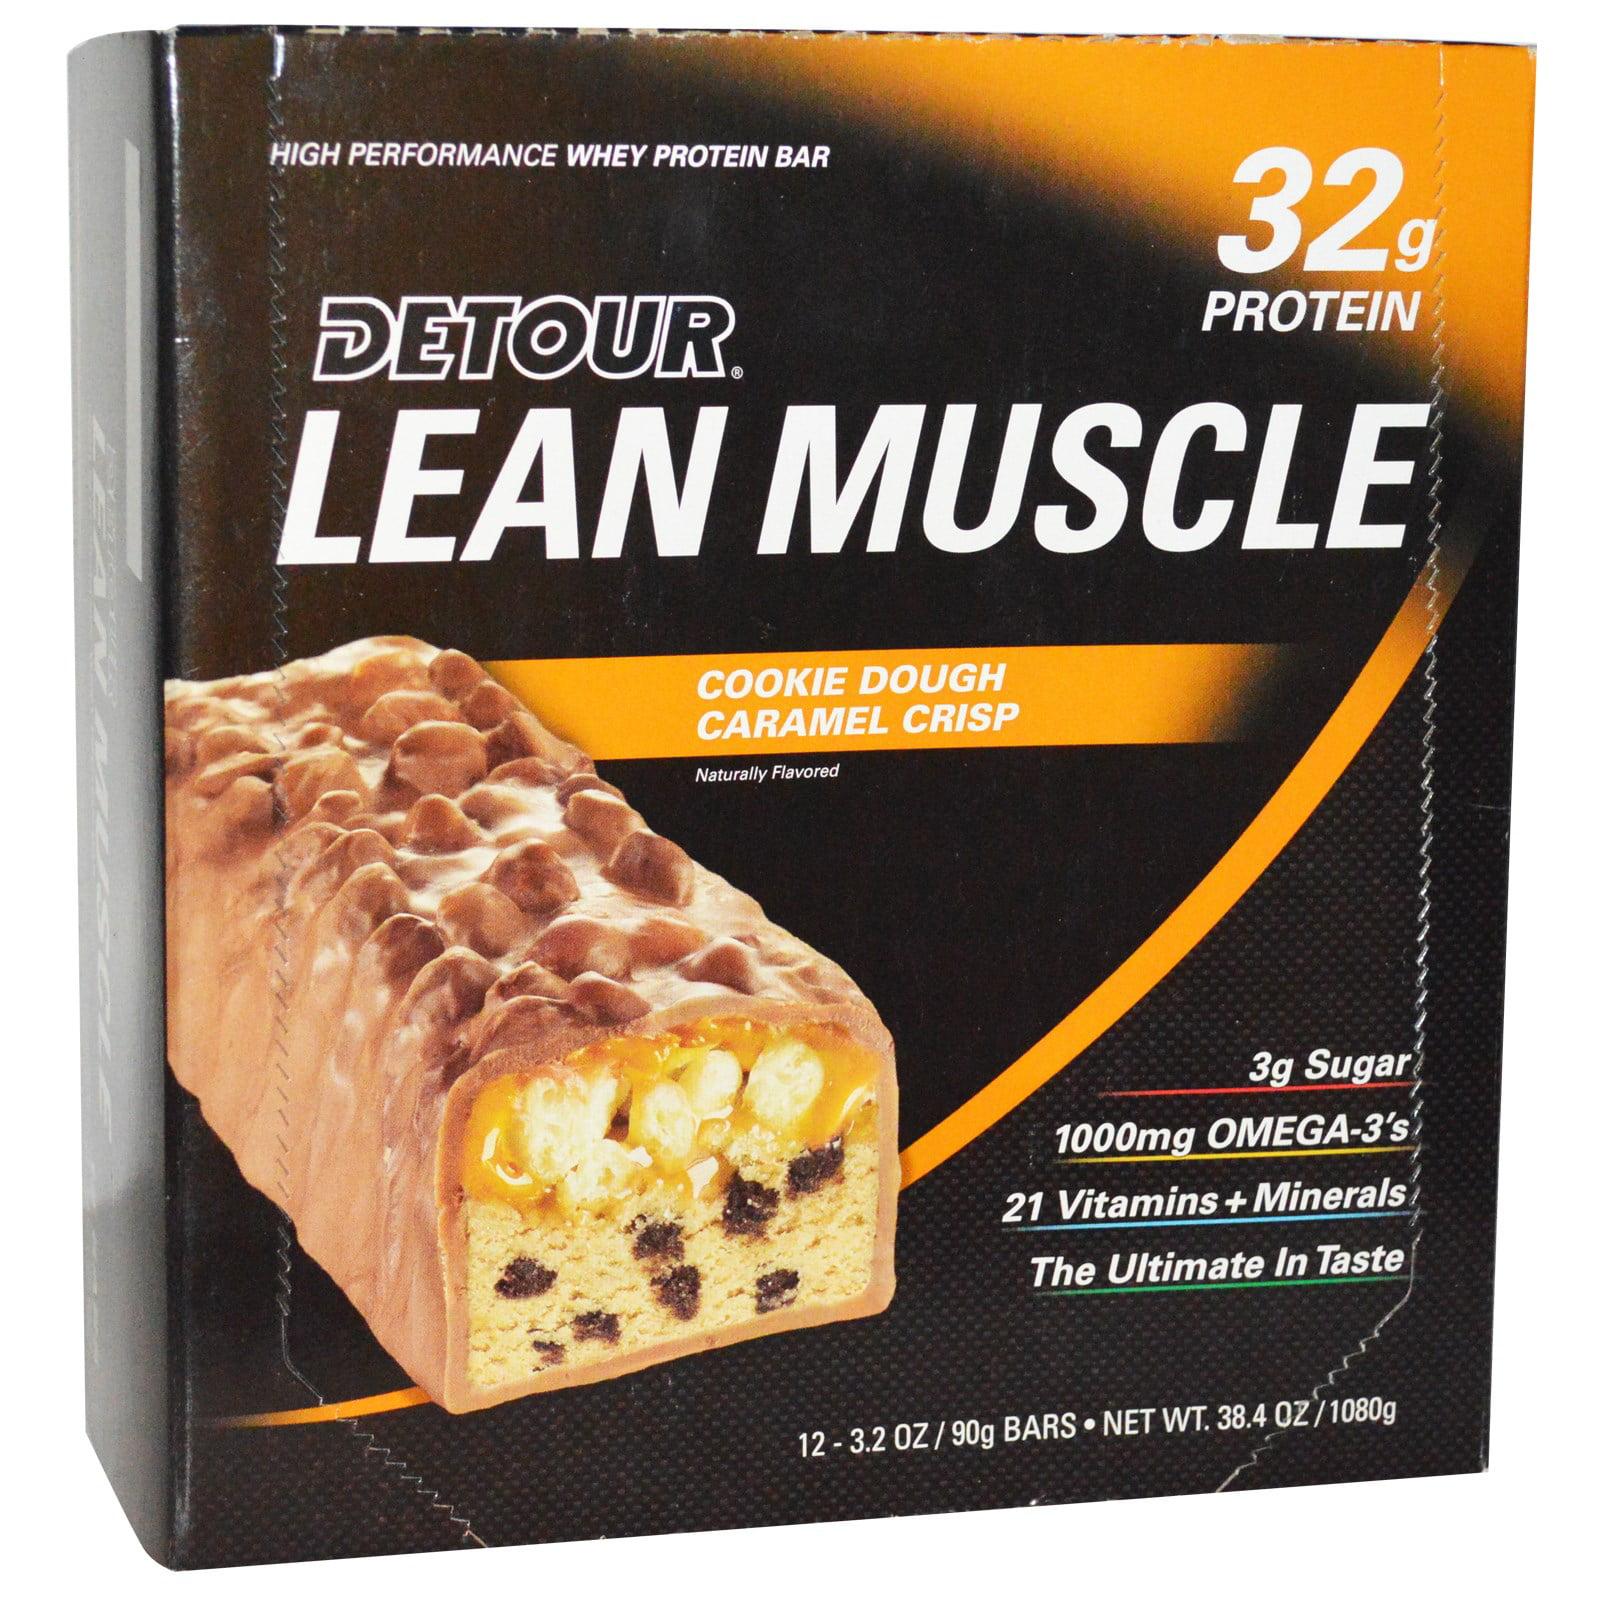 Detour LEAN MUSCLE Cookie Dough Caramel Crisp Protein Bar, 3.2 oz, 12 count by Forward Foods LLC